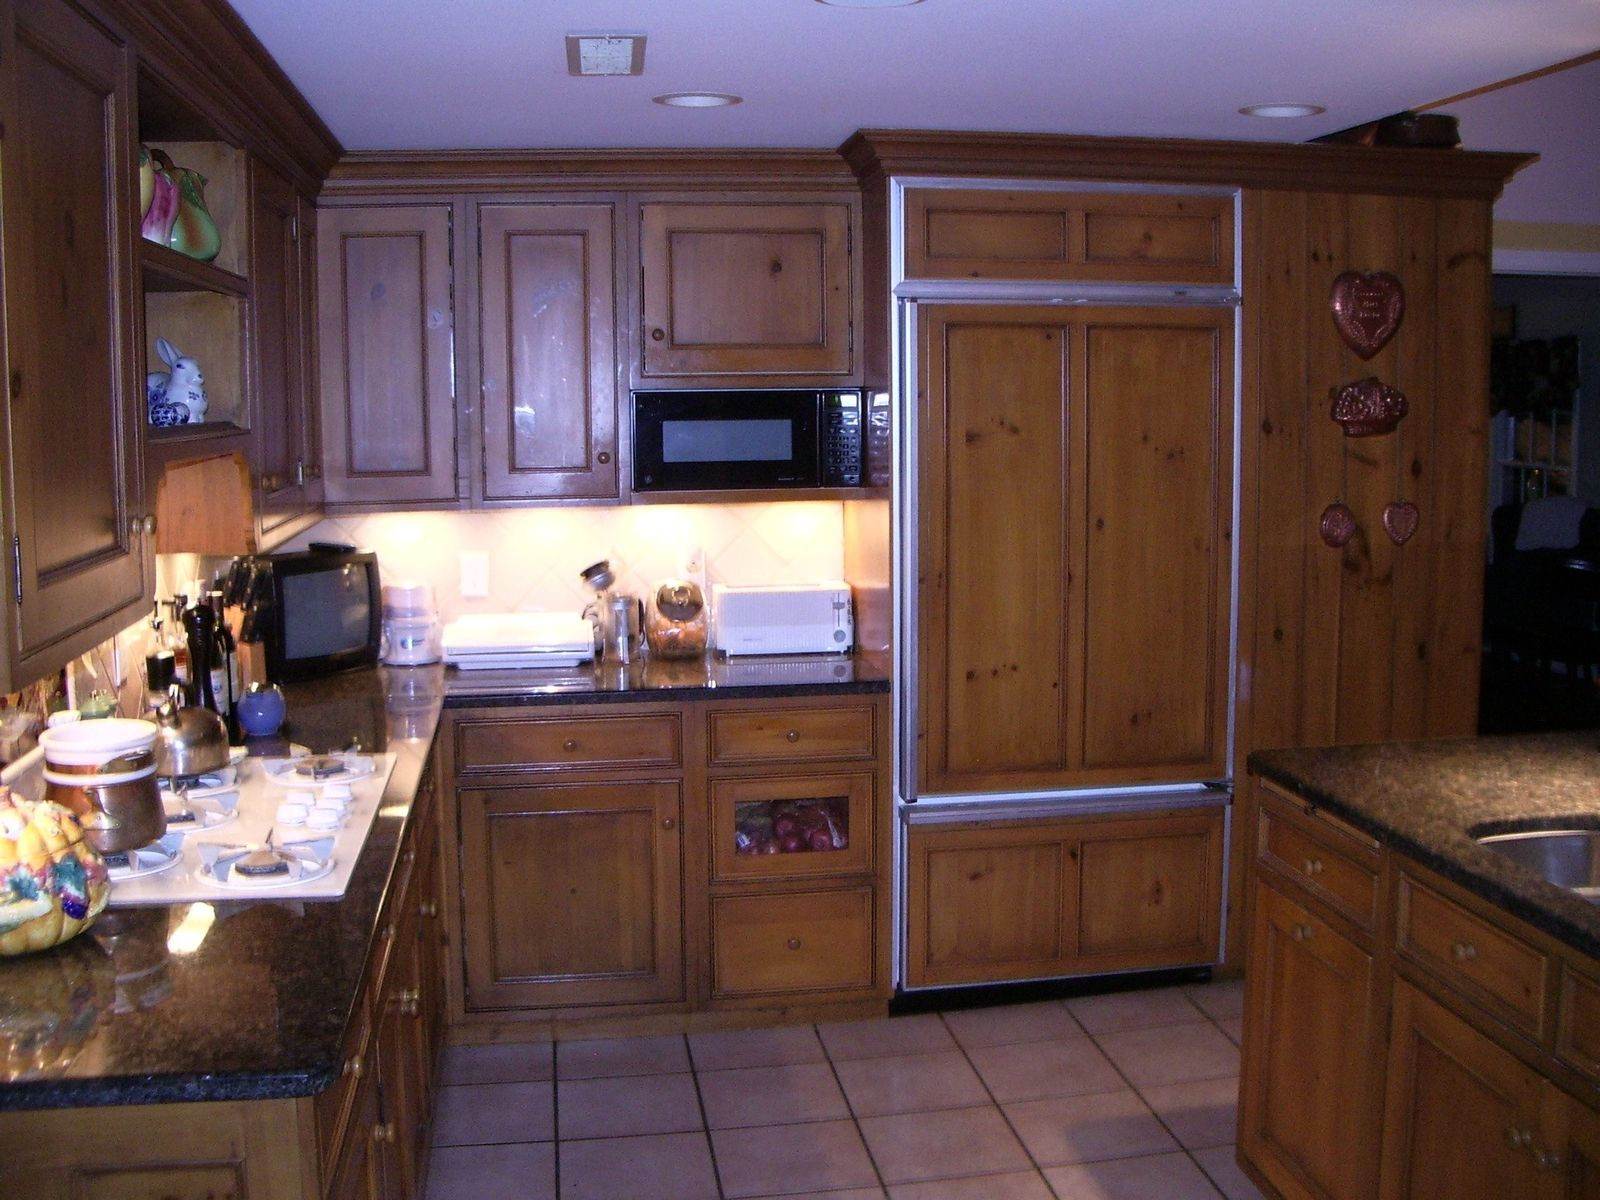 Handmade Knotty Pine Kitchen by Edko Cabinets Llc